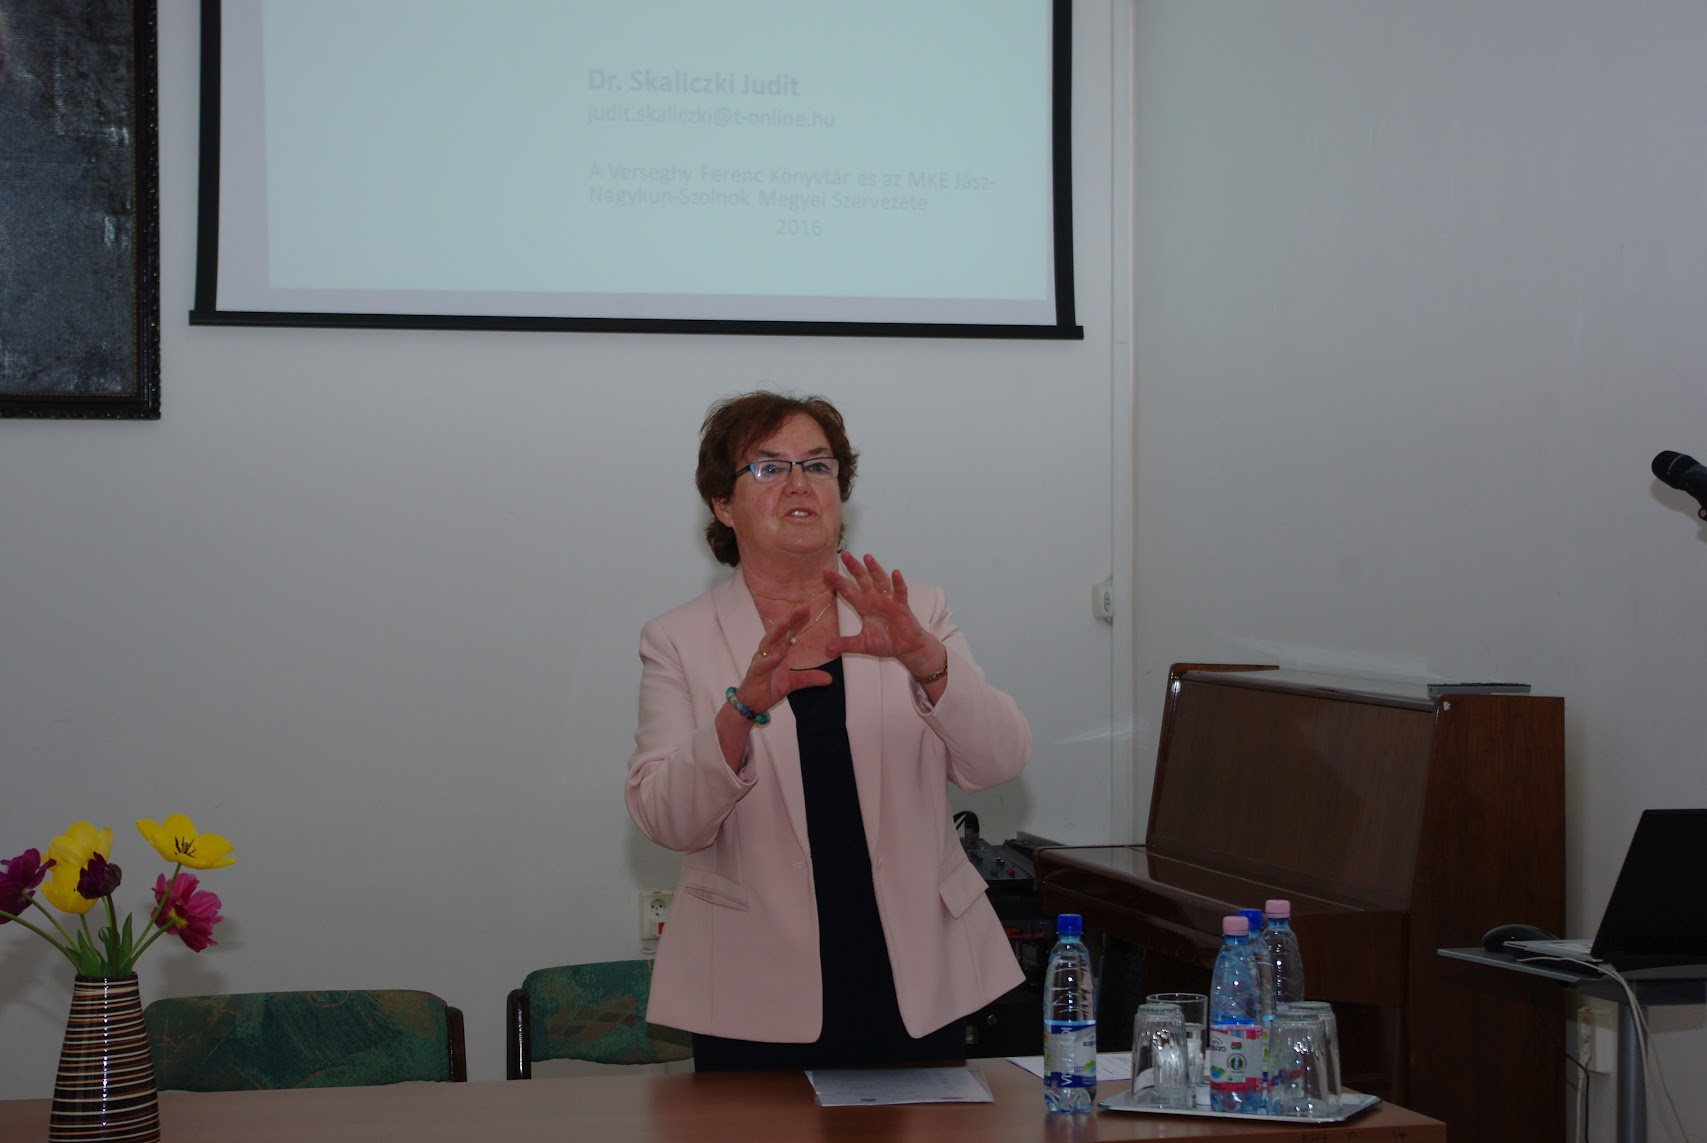 Dr. Skaliczki Judit